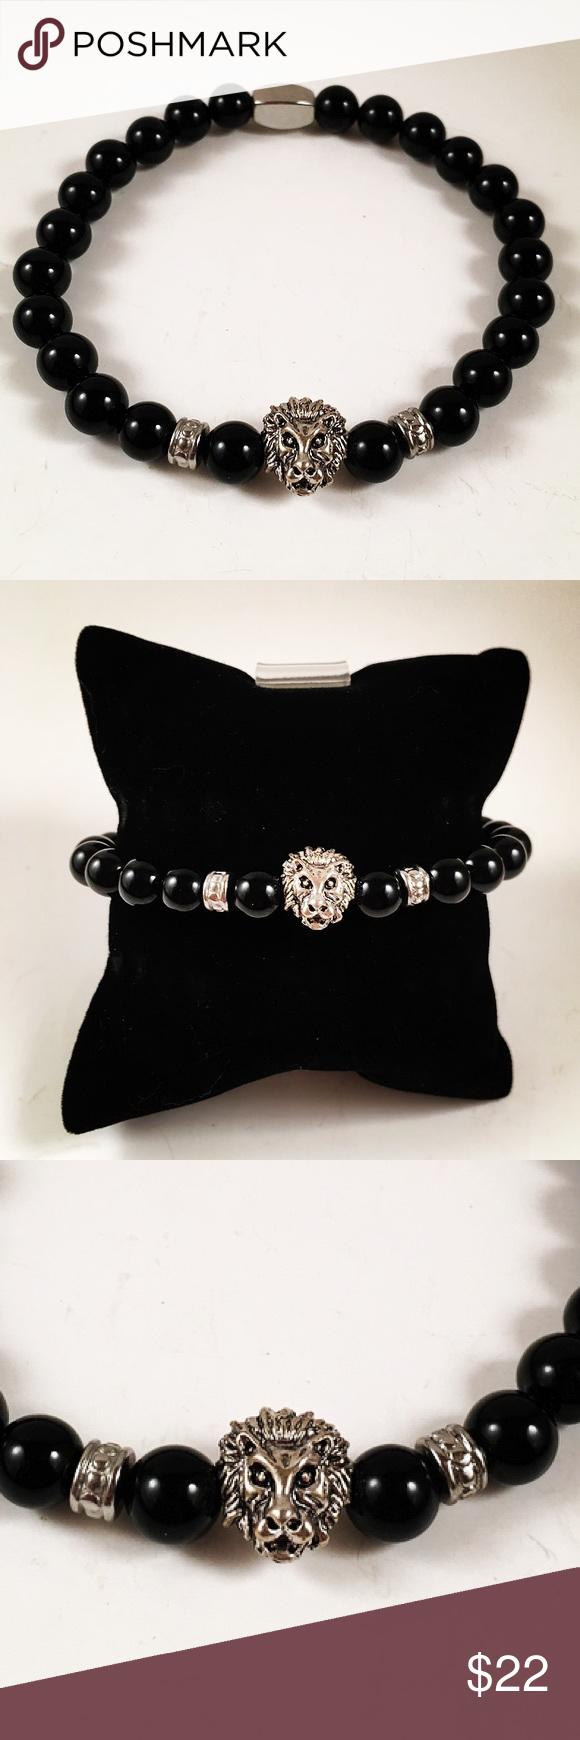 Men onyx beaded lion head bracelet men beaded bracelet fits most